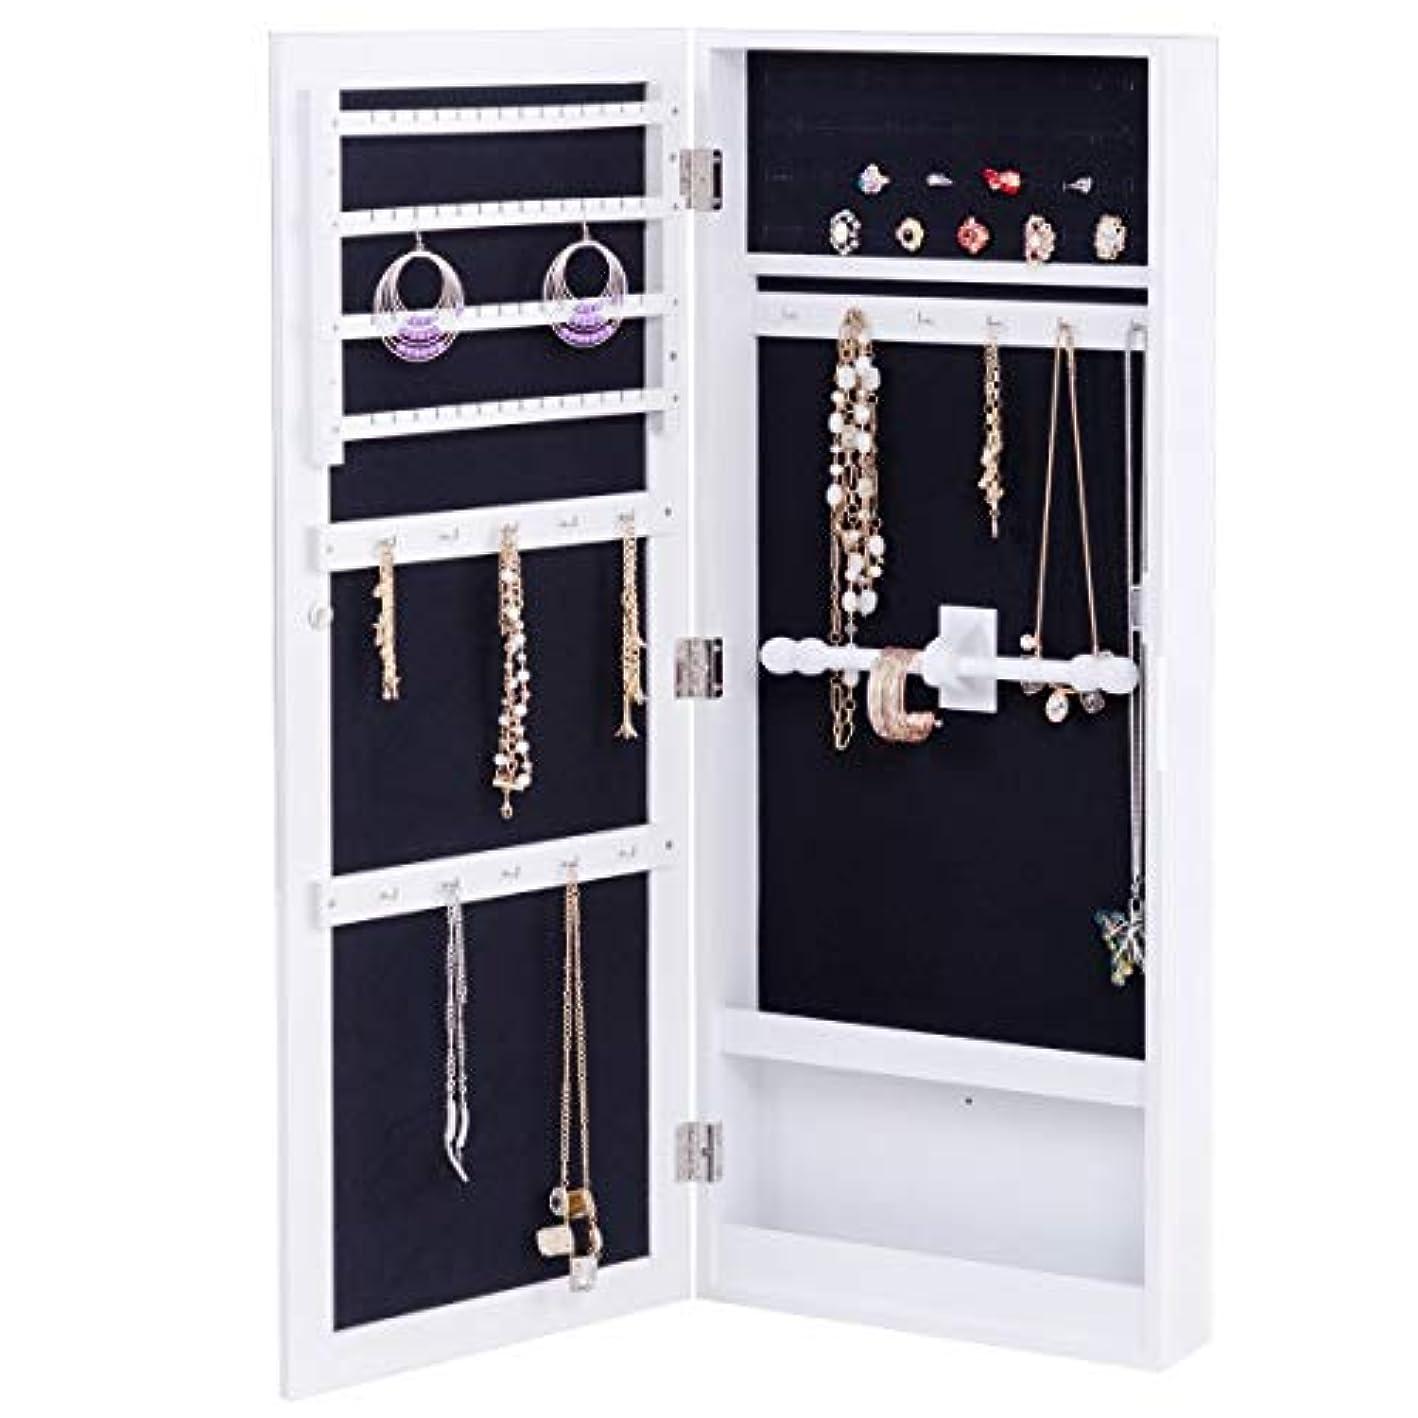 Giantex Jewelry Armoire Cabinet Mounted Mirrored Jewelry Organizer Storage, Flash Silvery